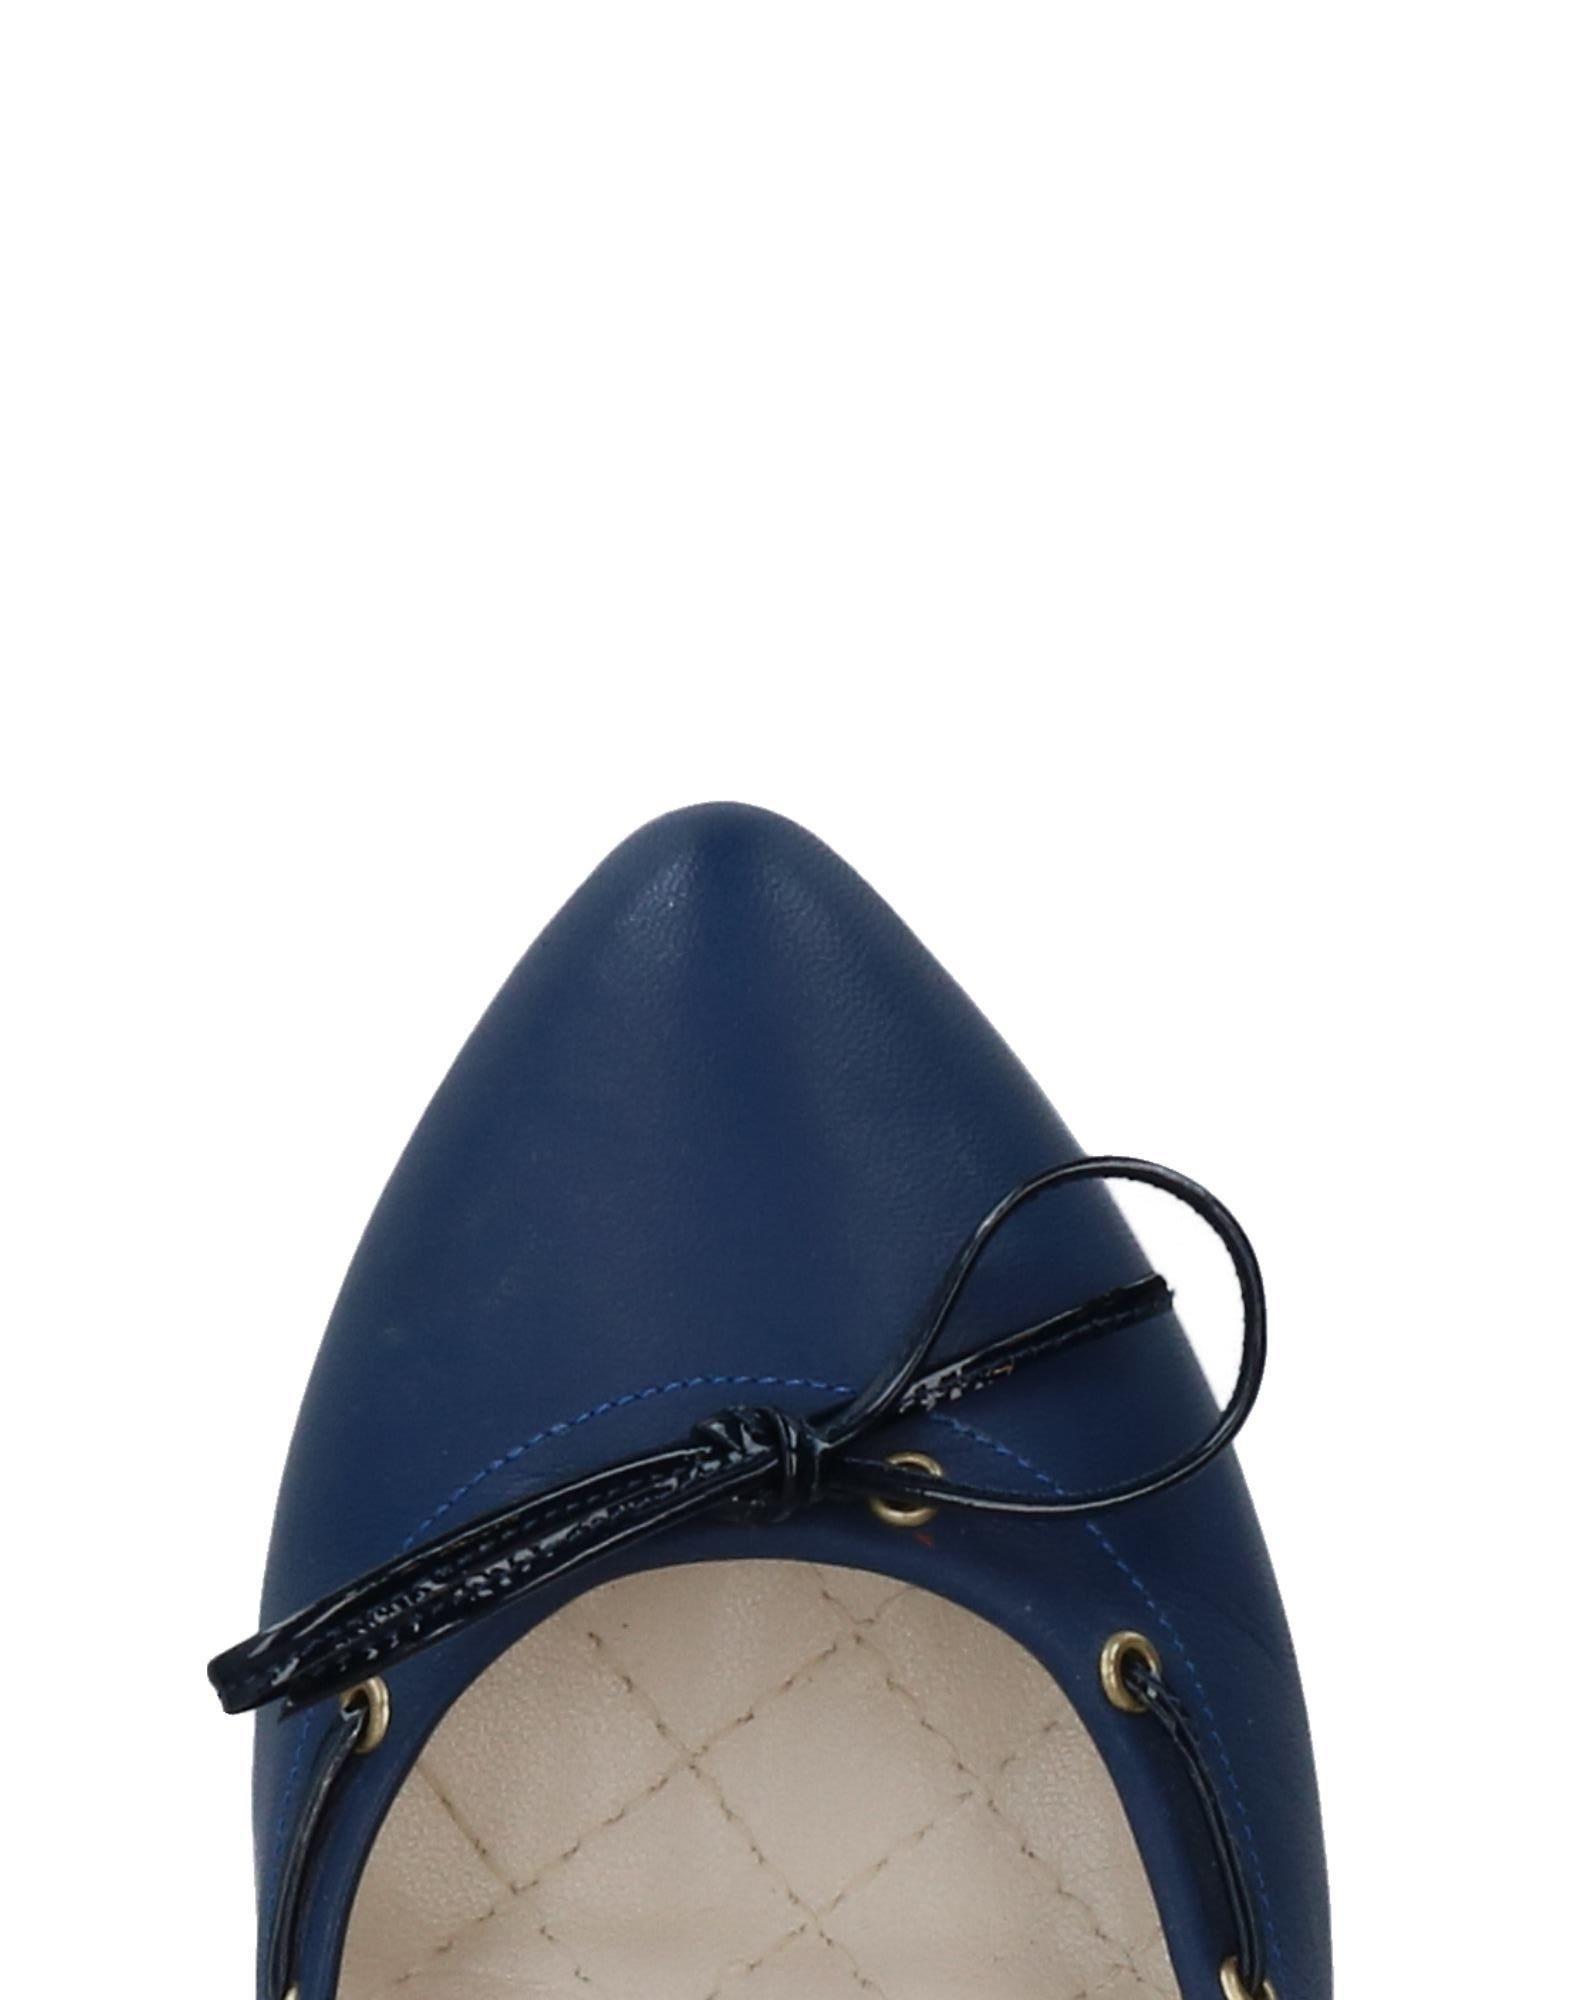 Gut um billige Schuhe Damen zu tragenLuciano Vani Pumps Damen Schuhe  11322868HX 736103